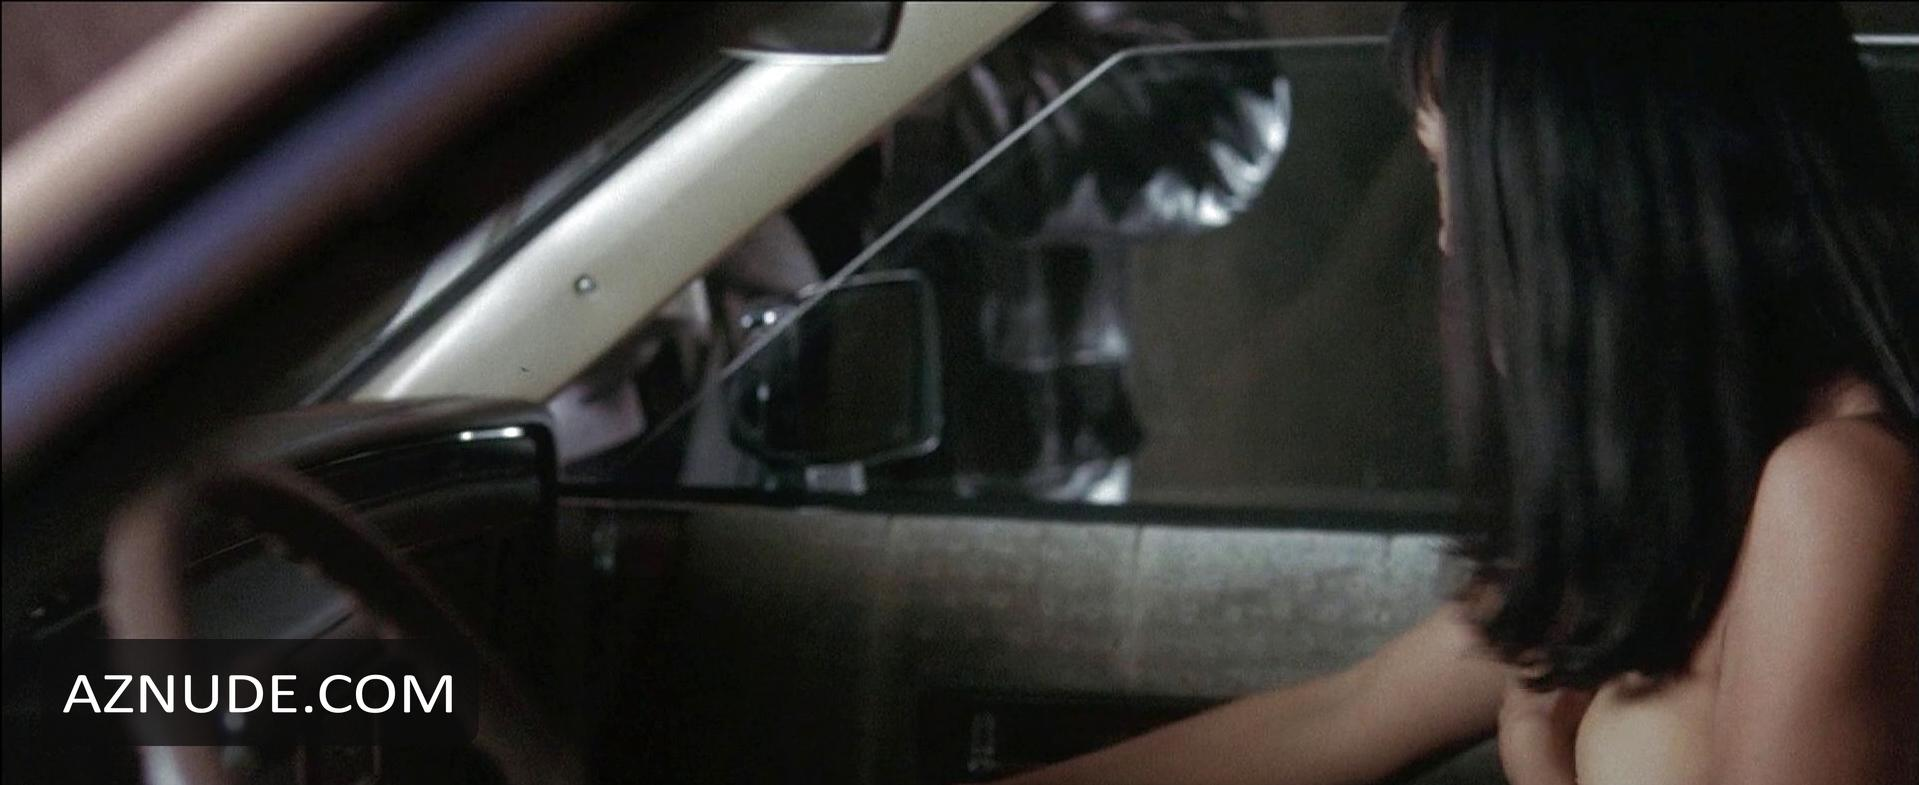 Lucy liu sex tape real hidden cam las vegas hotel room - 3 10